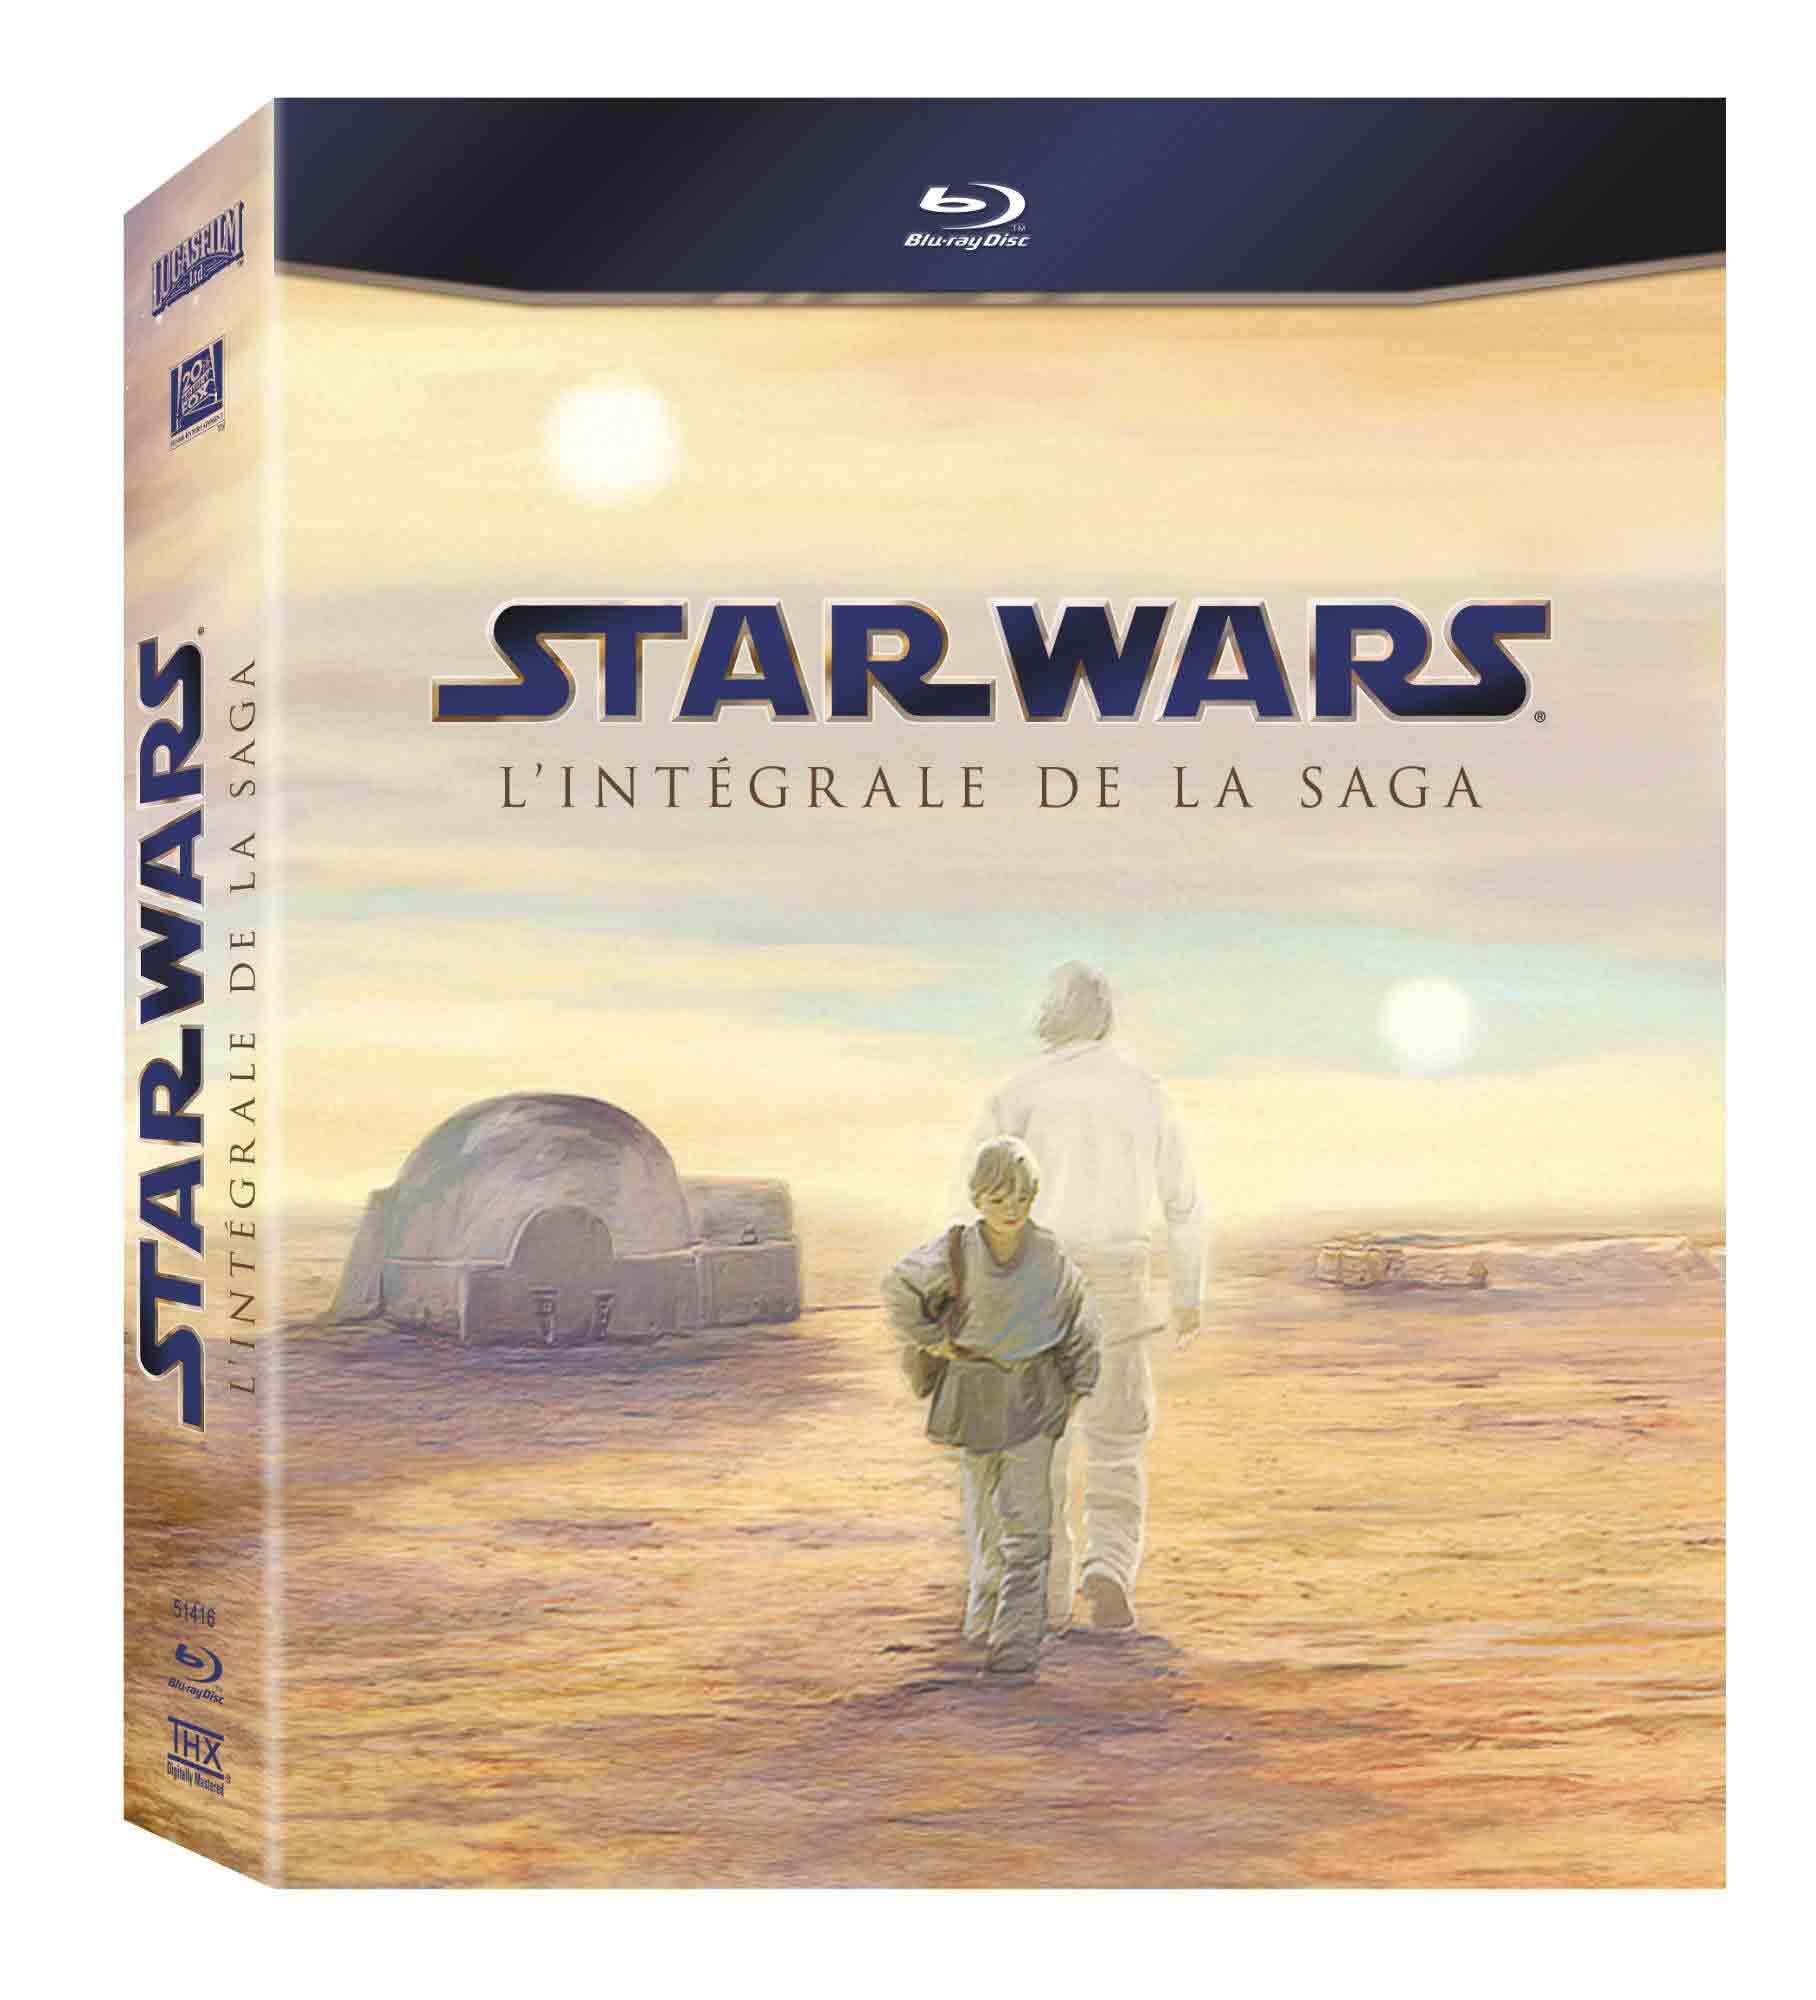 Star Wars : coffrets Blu-ray [Lucasfilm - 2011] - Page 5 19732384